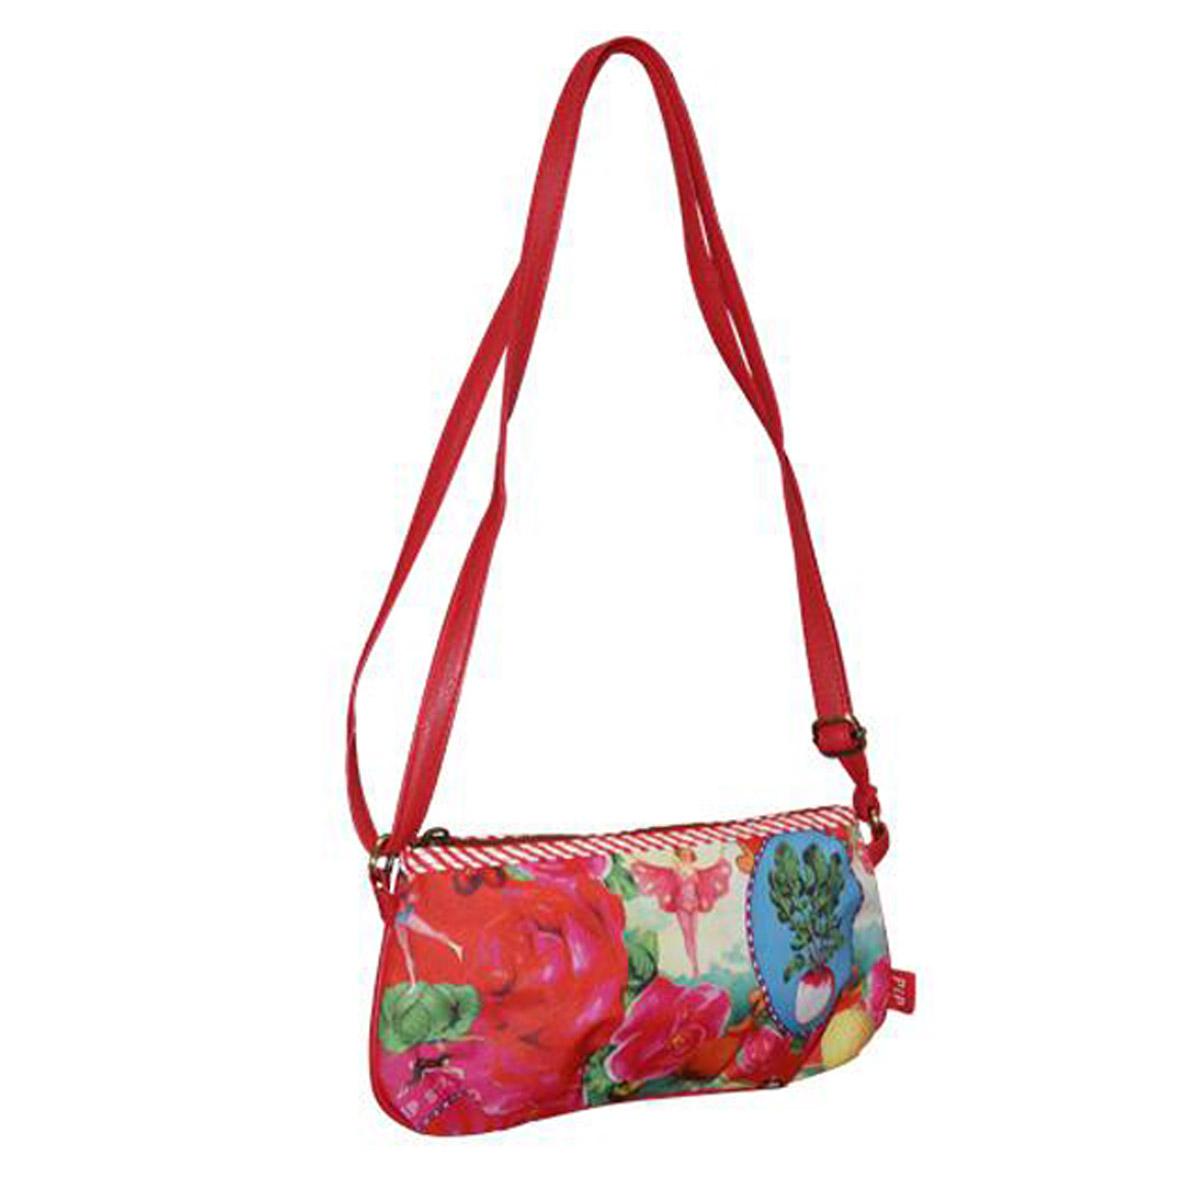 pip studio girly bag rot handtasche abendtasche umh ngetasche tasche beutel kosmetiktasche sport. Black Bedroom Furniture Sets. Home Design Ideas